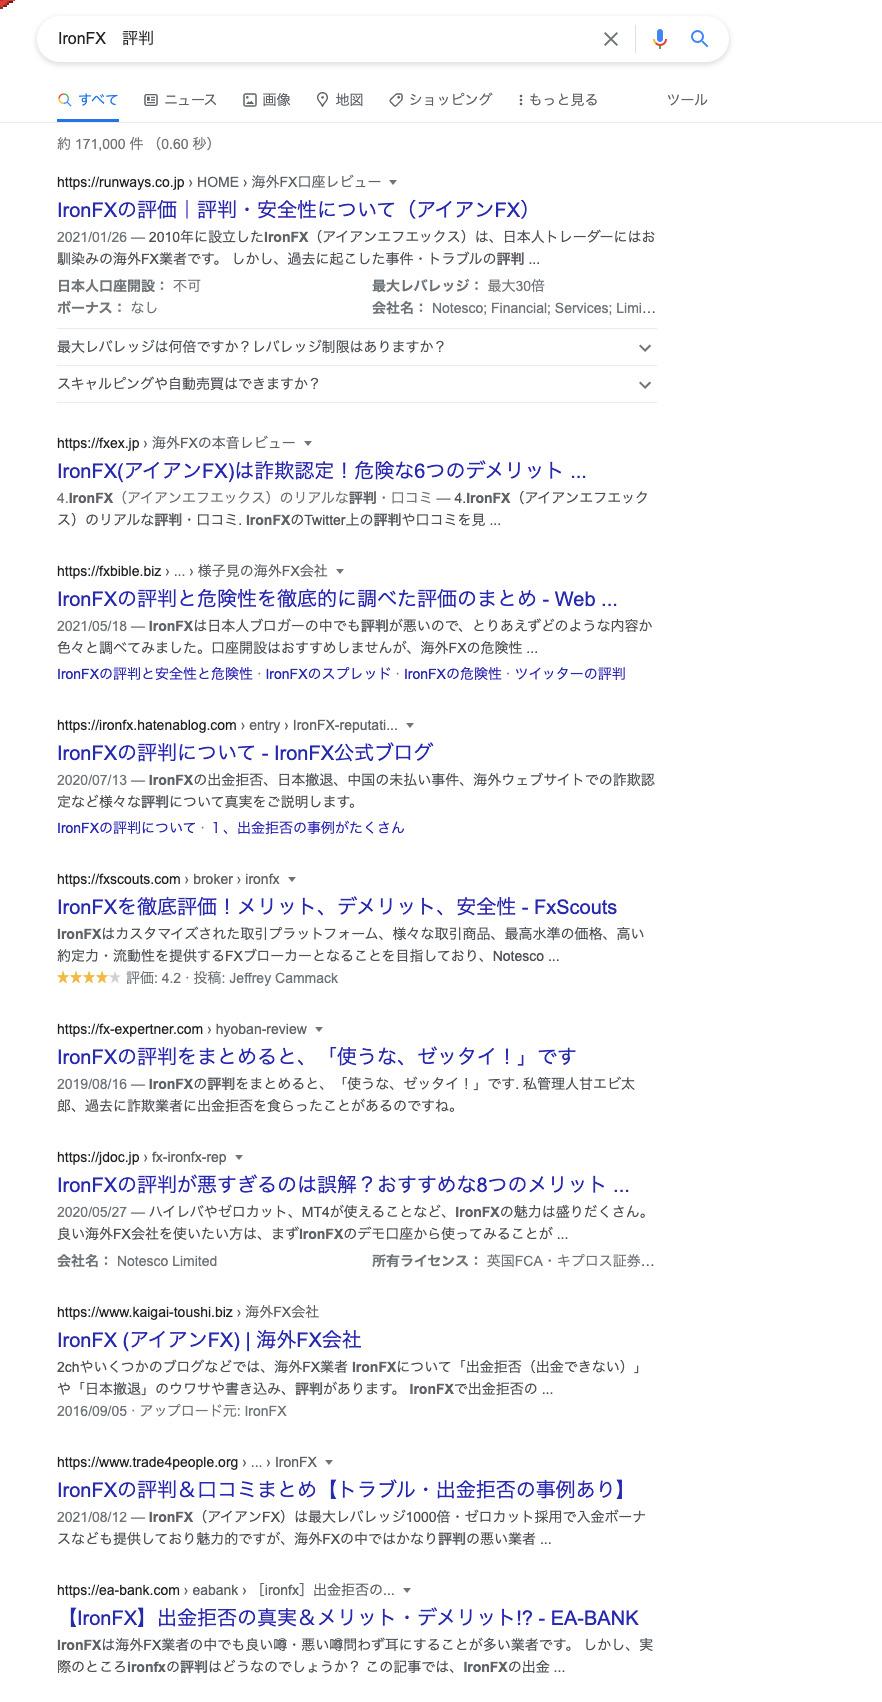 証券会社 Iron Forec 評判